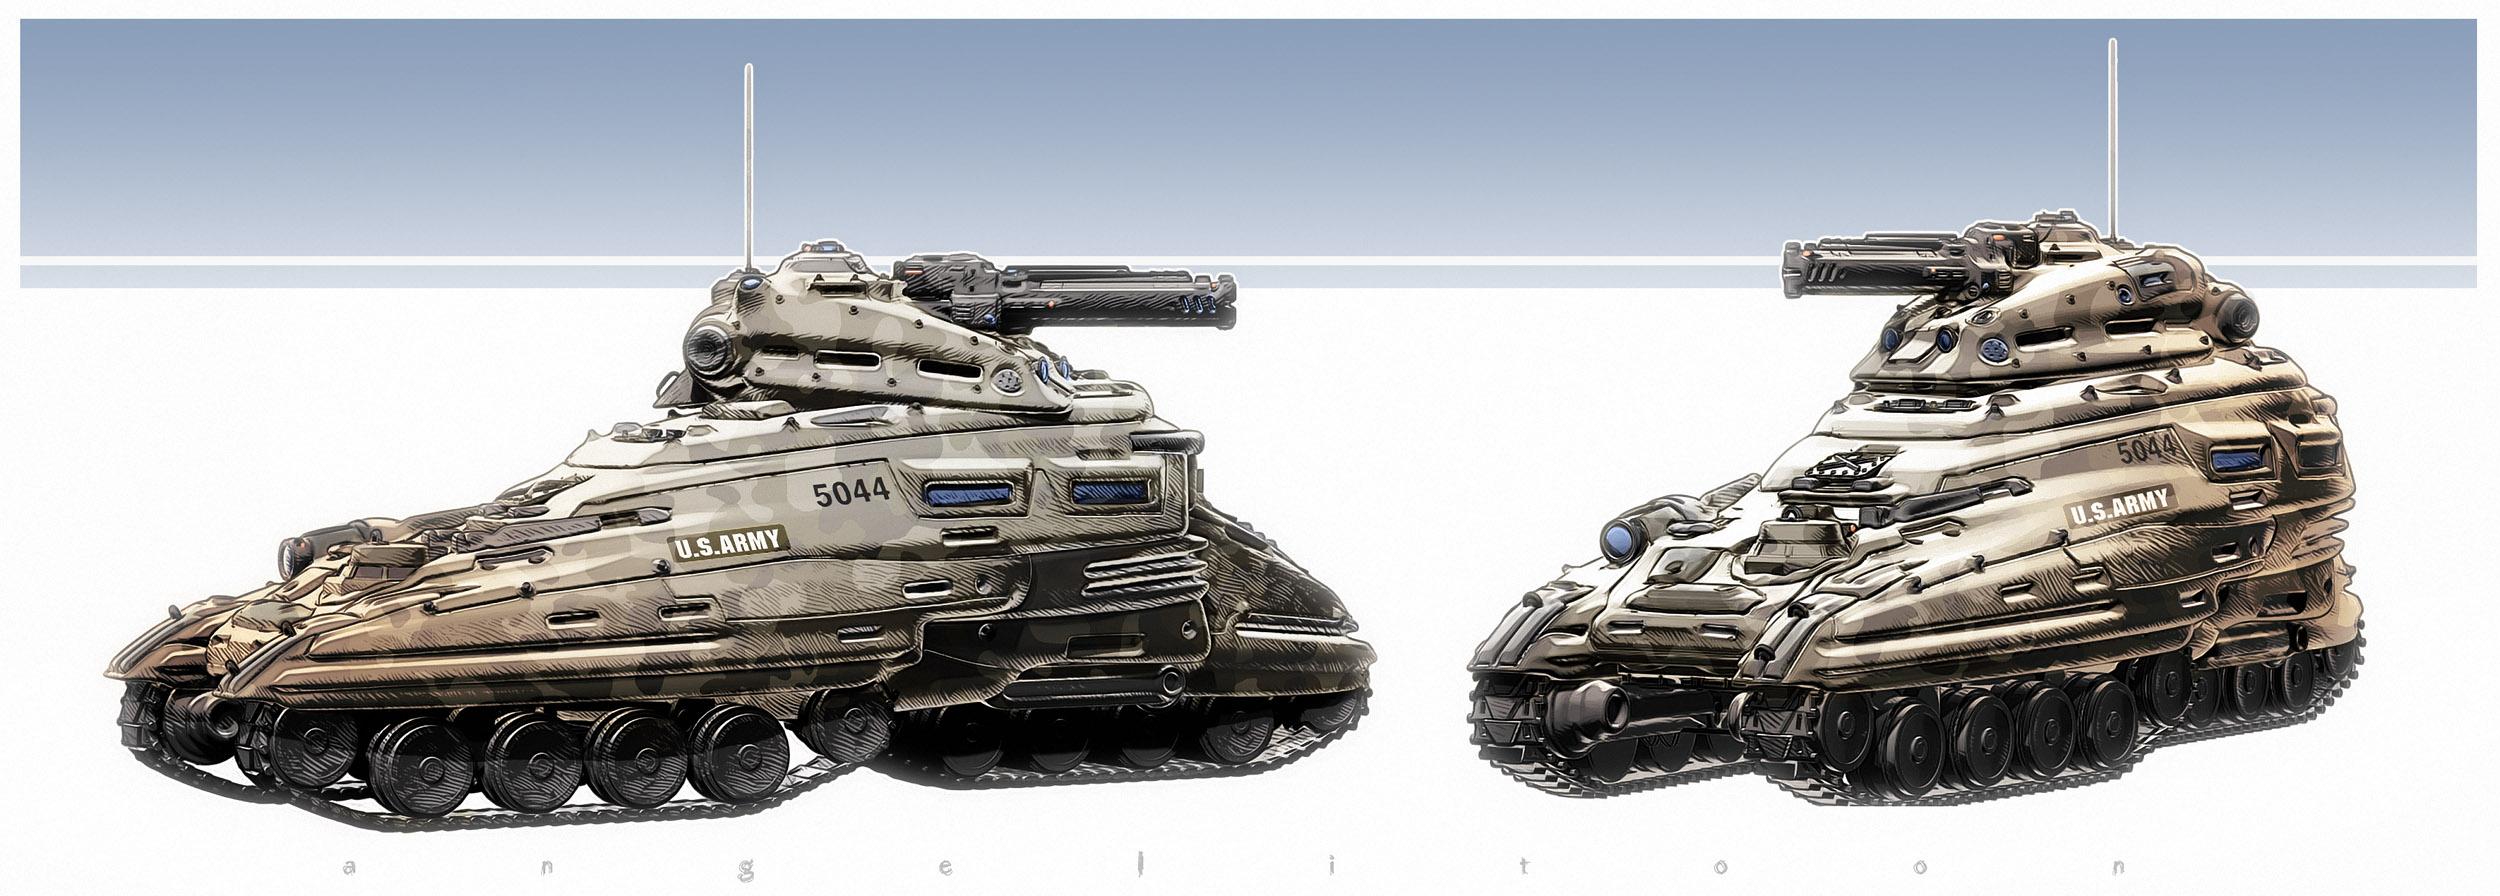 Sci fi Tank by angelitoon